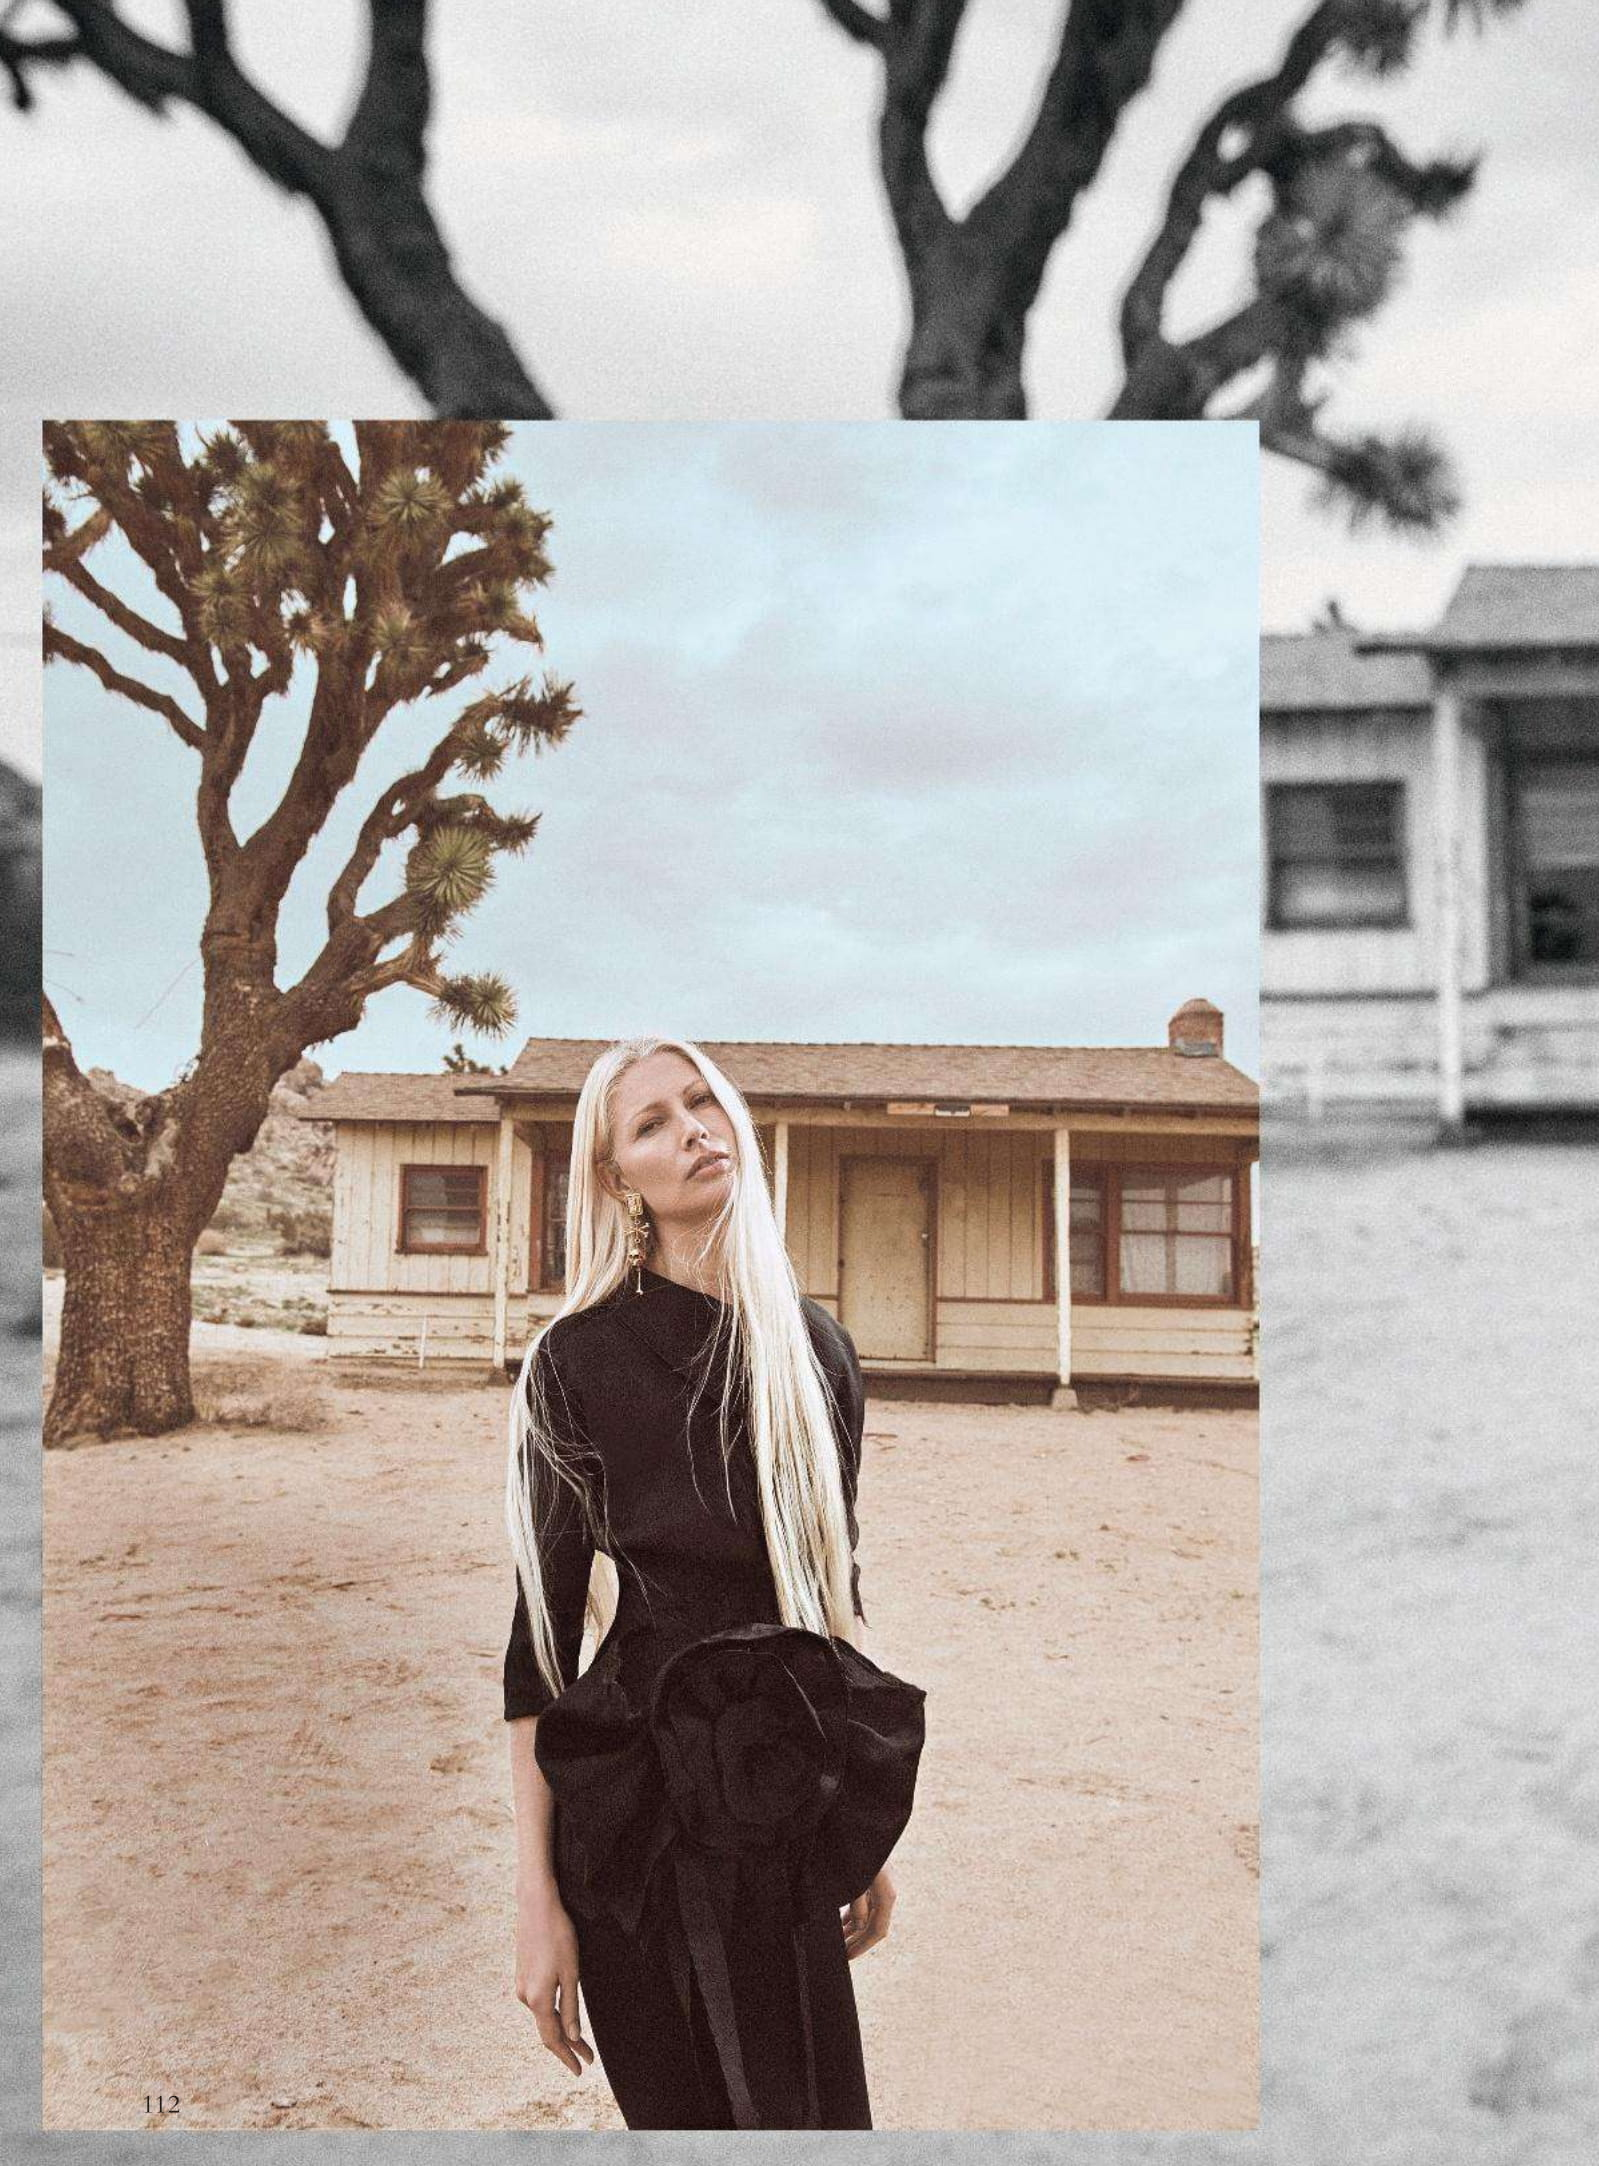 Kirsty-Hume-Regan-Cameron-Harpers-Bazaar-Germany-April-2019- (14).jpg